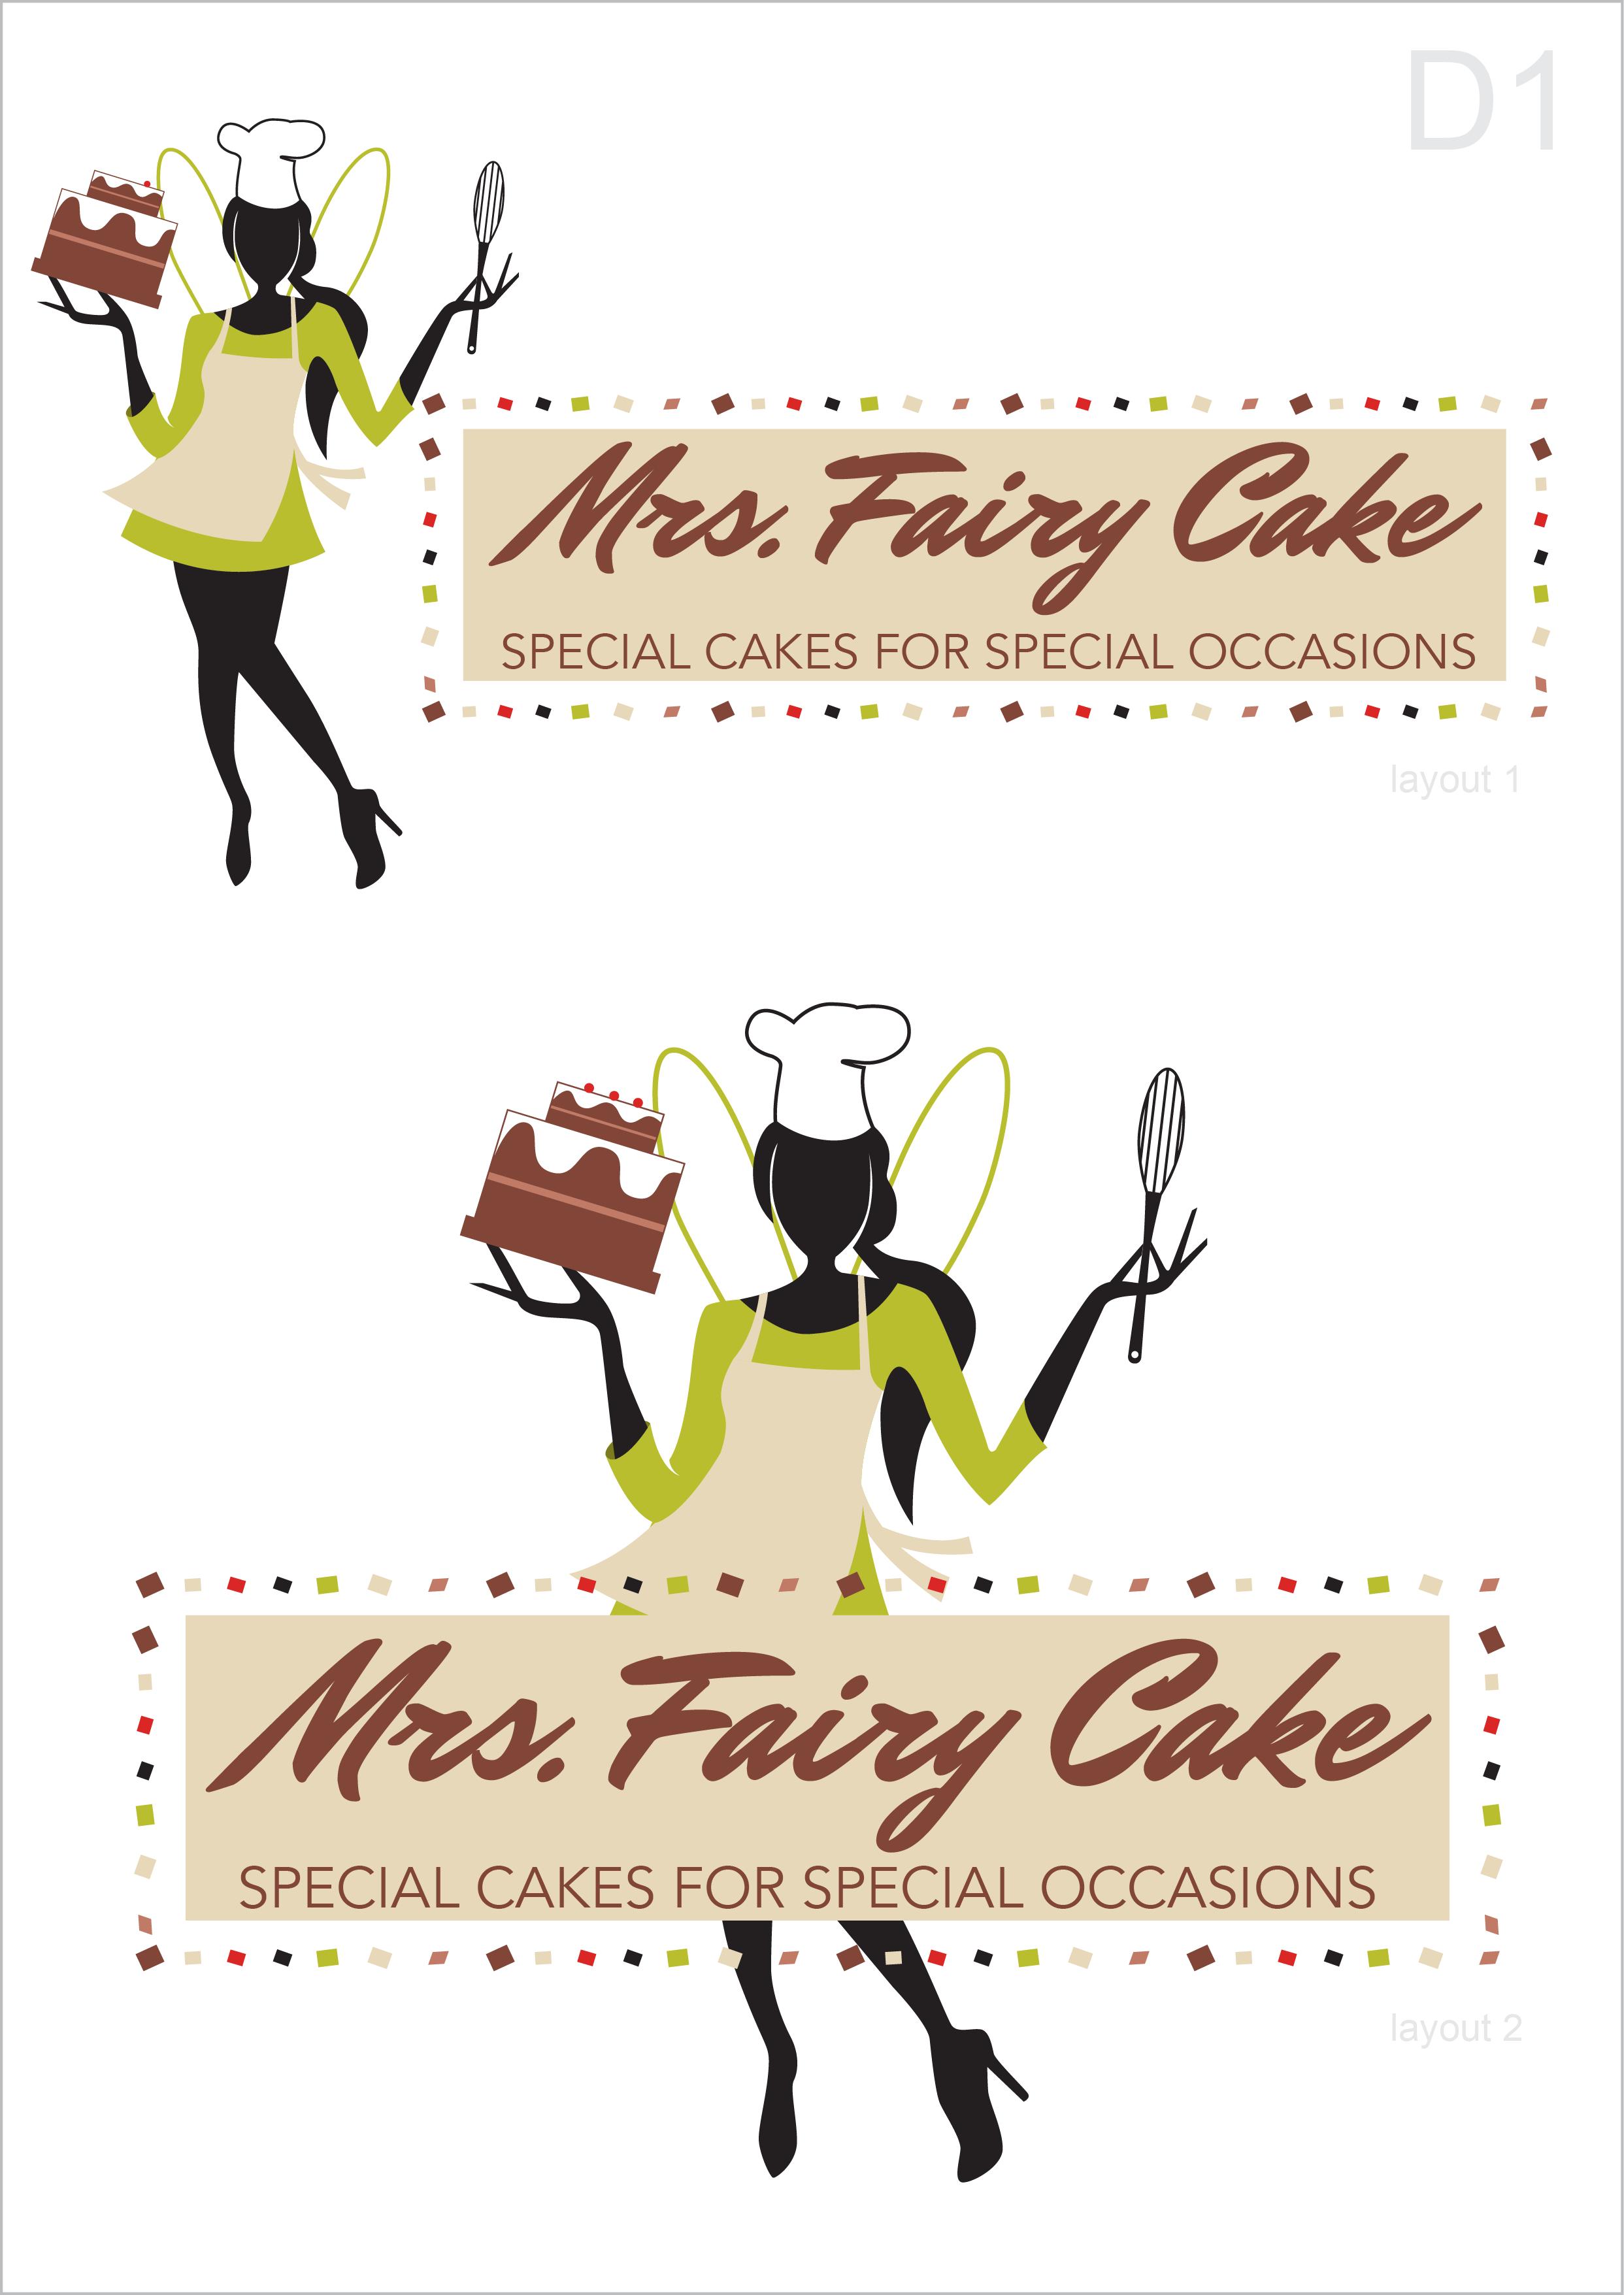 Mrs Fairy Cake logo1.png